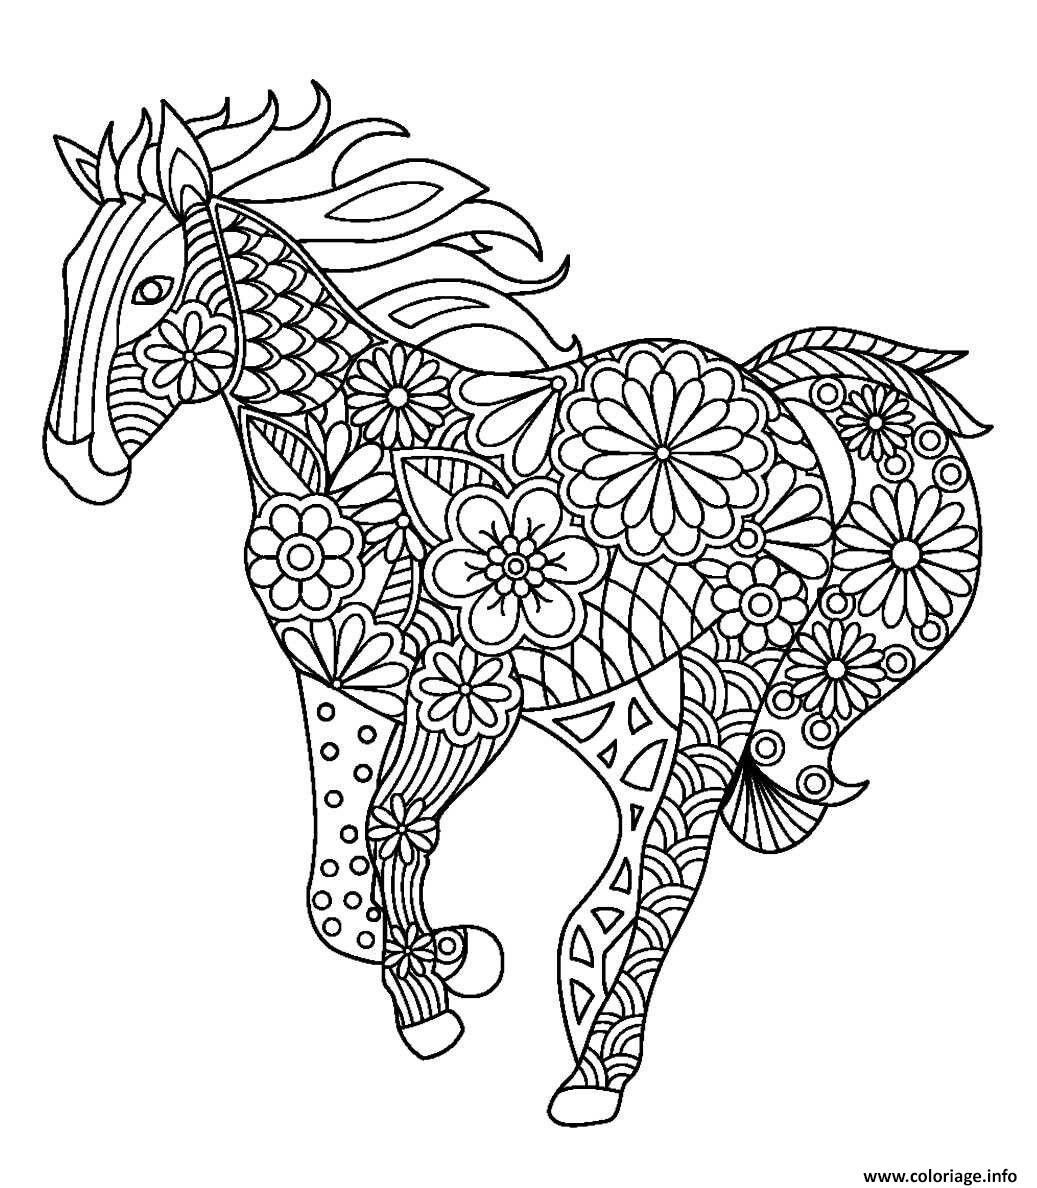 Coloriage A Imprimer Mandala Chevaux   Animal coloring pages ...